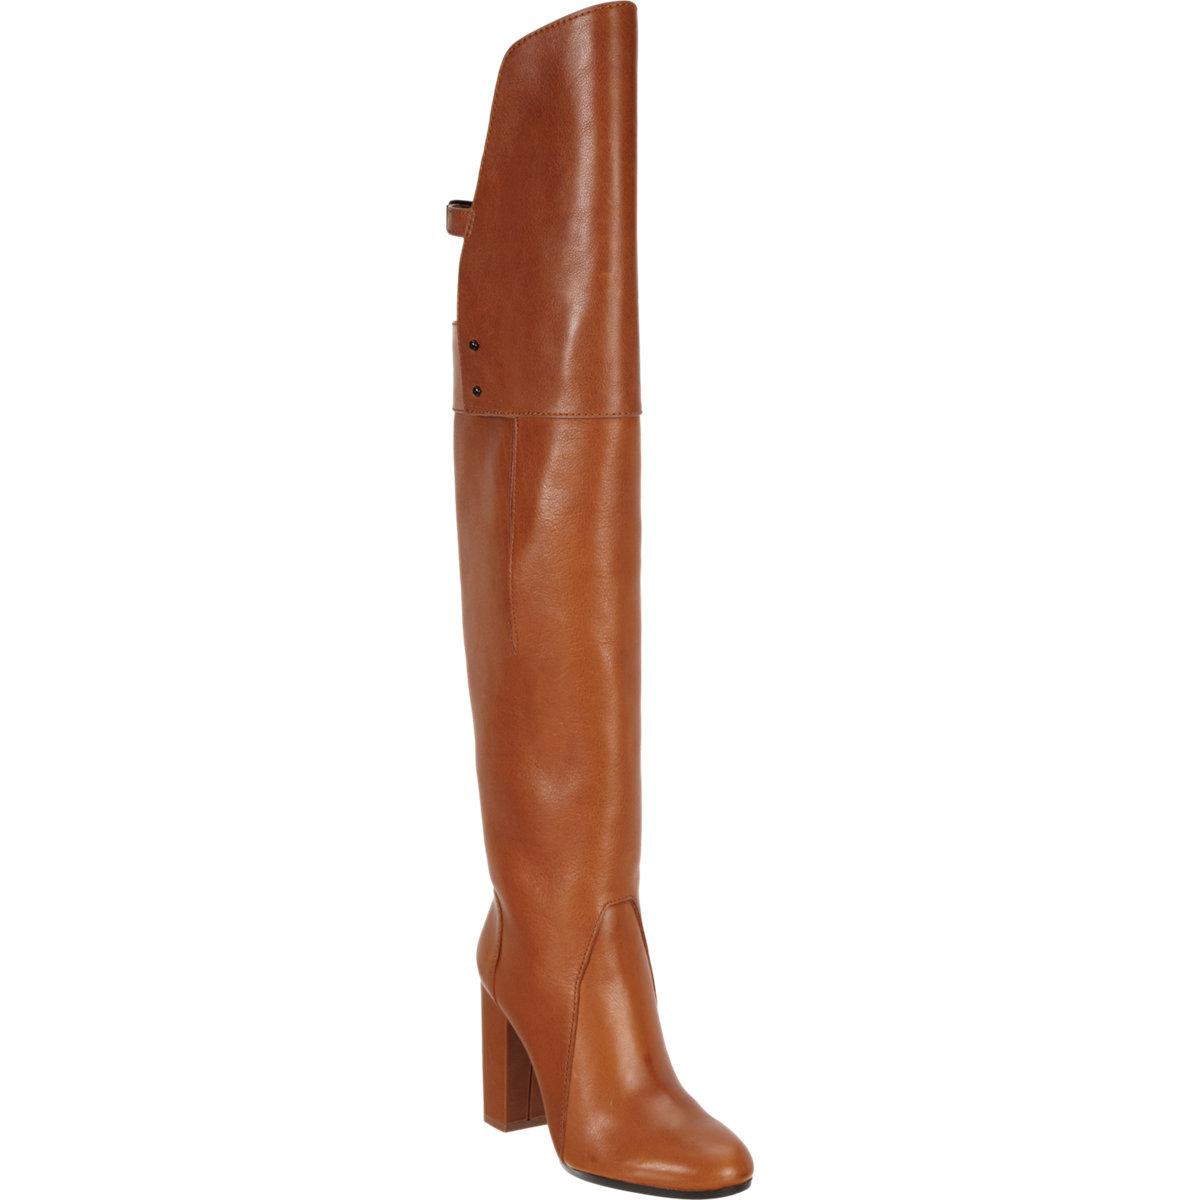 3.1-Phillip-Lim-Ora-Over-The-Knee-Boots $875.00  Harrods.Com